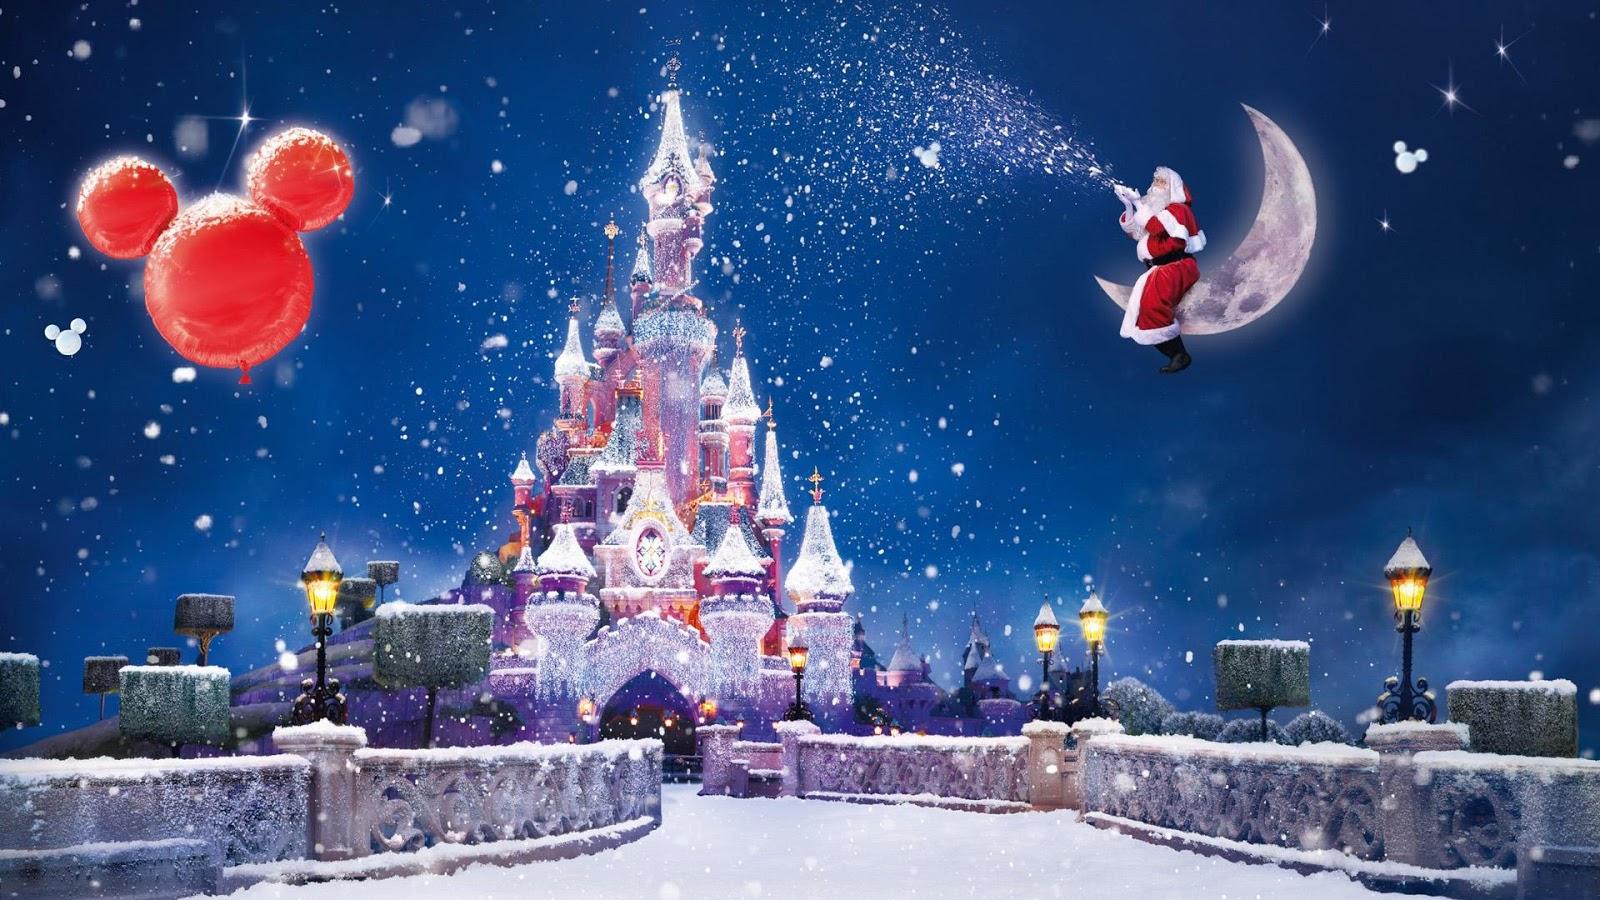 Christmas Wallpaper ADF free hd